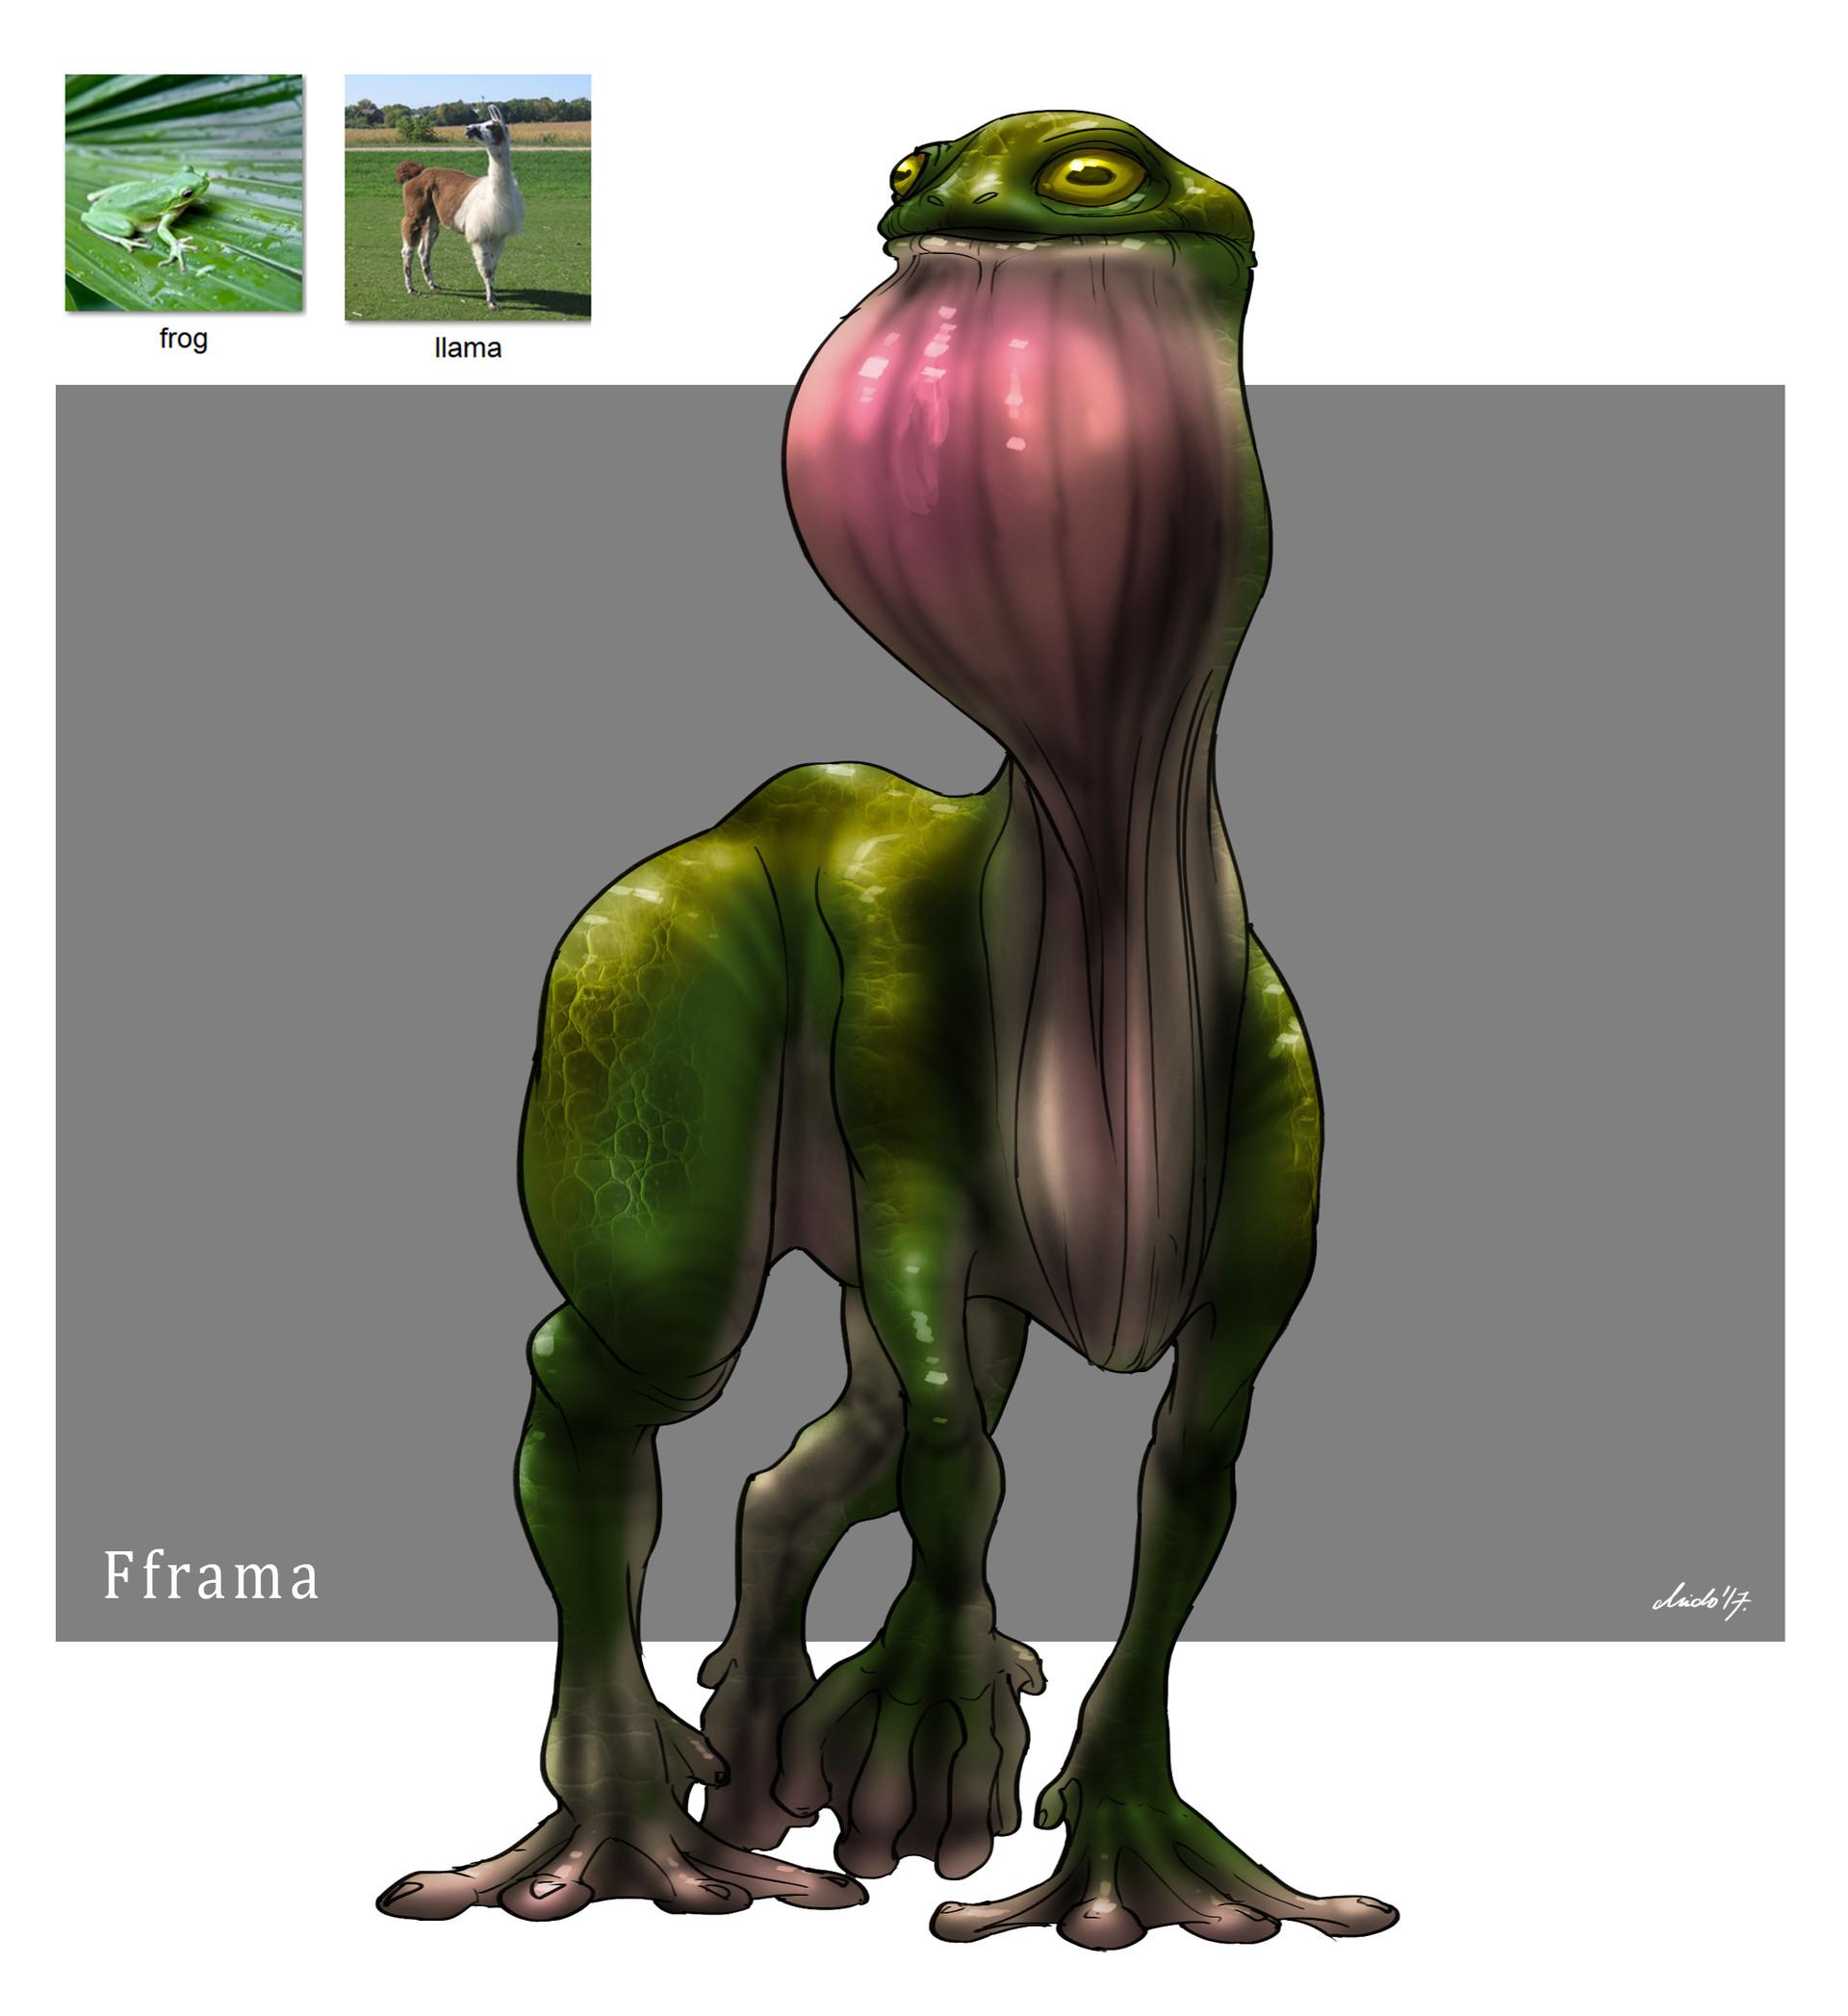 Midhat kapetanovic random creature mashup 026 fframa